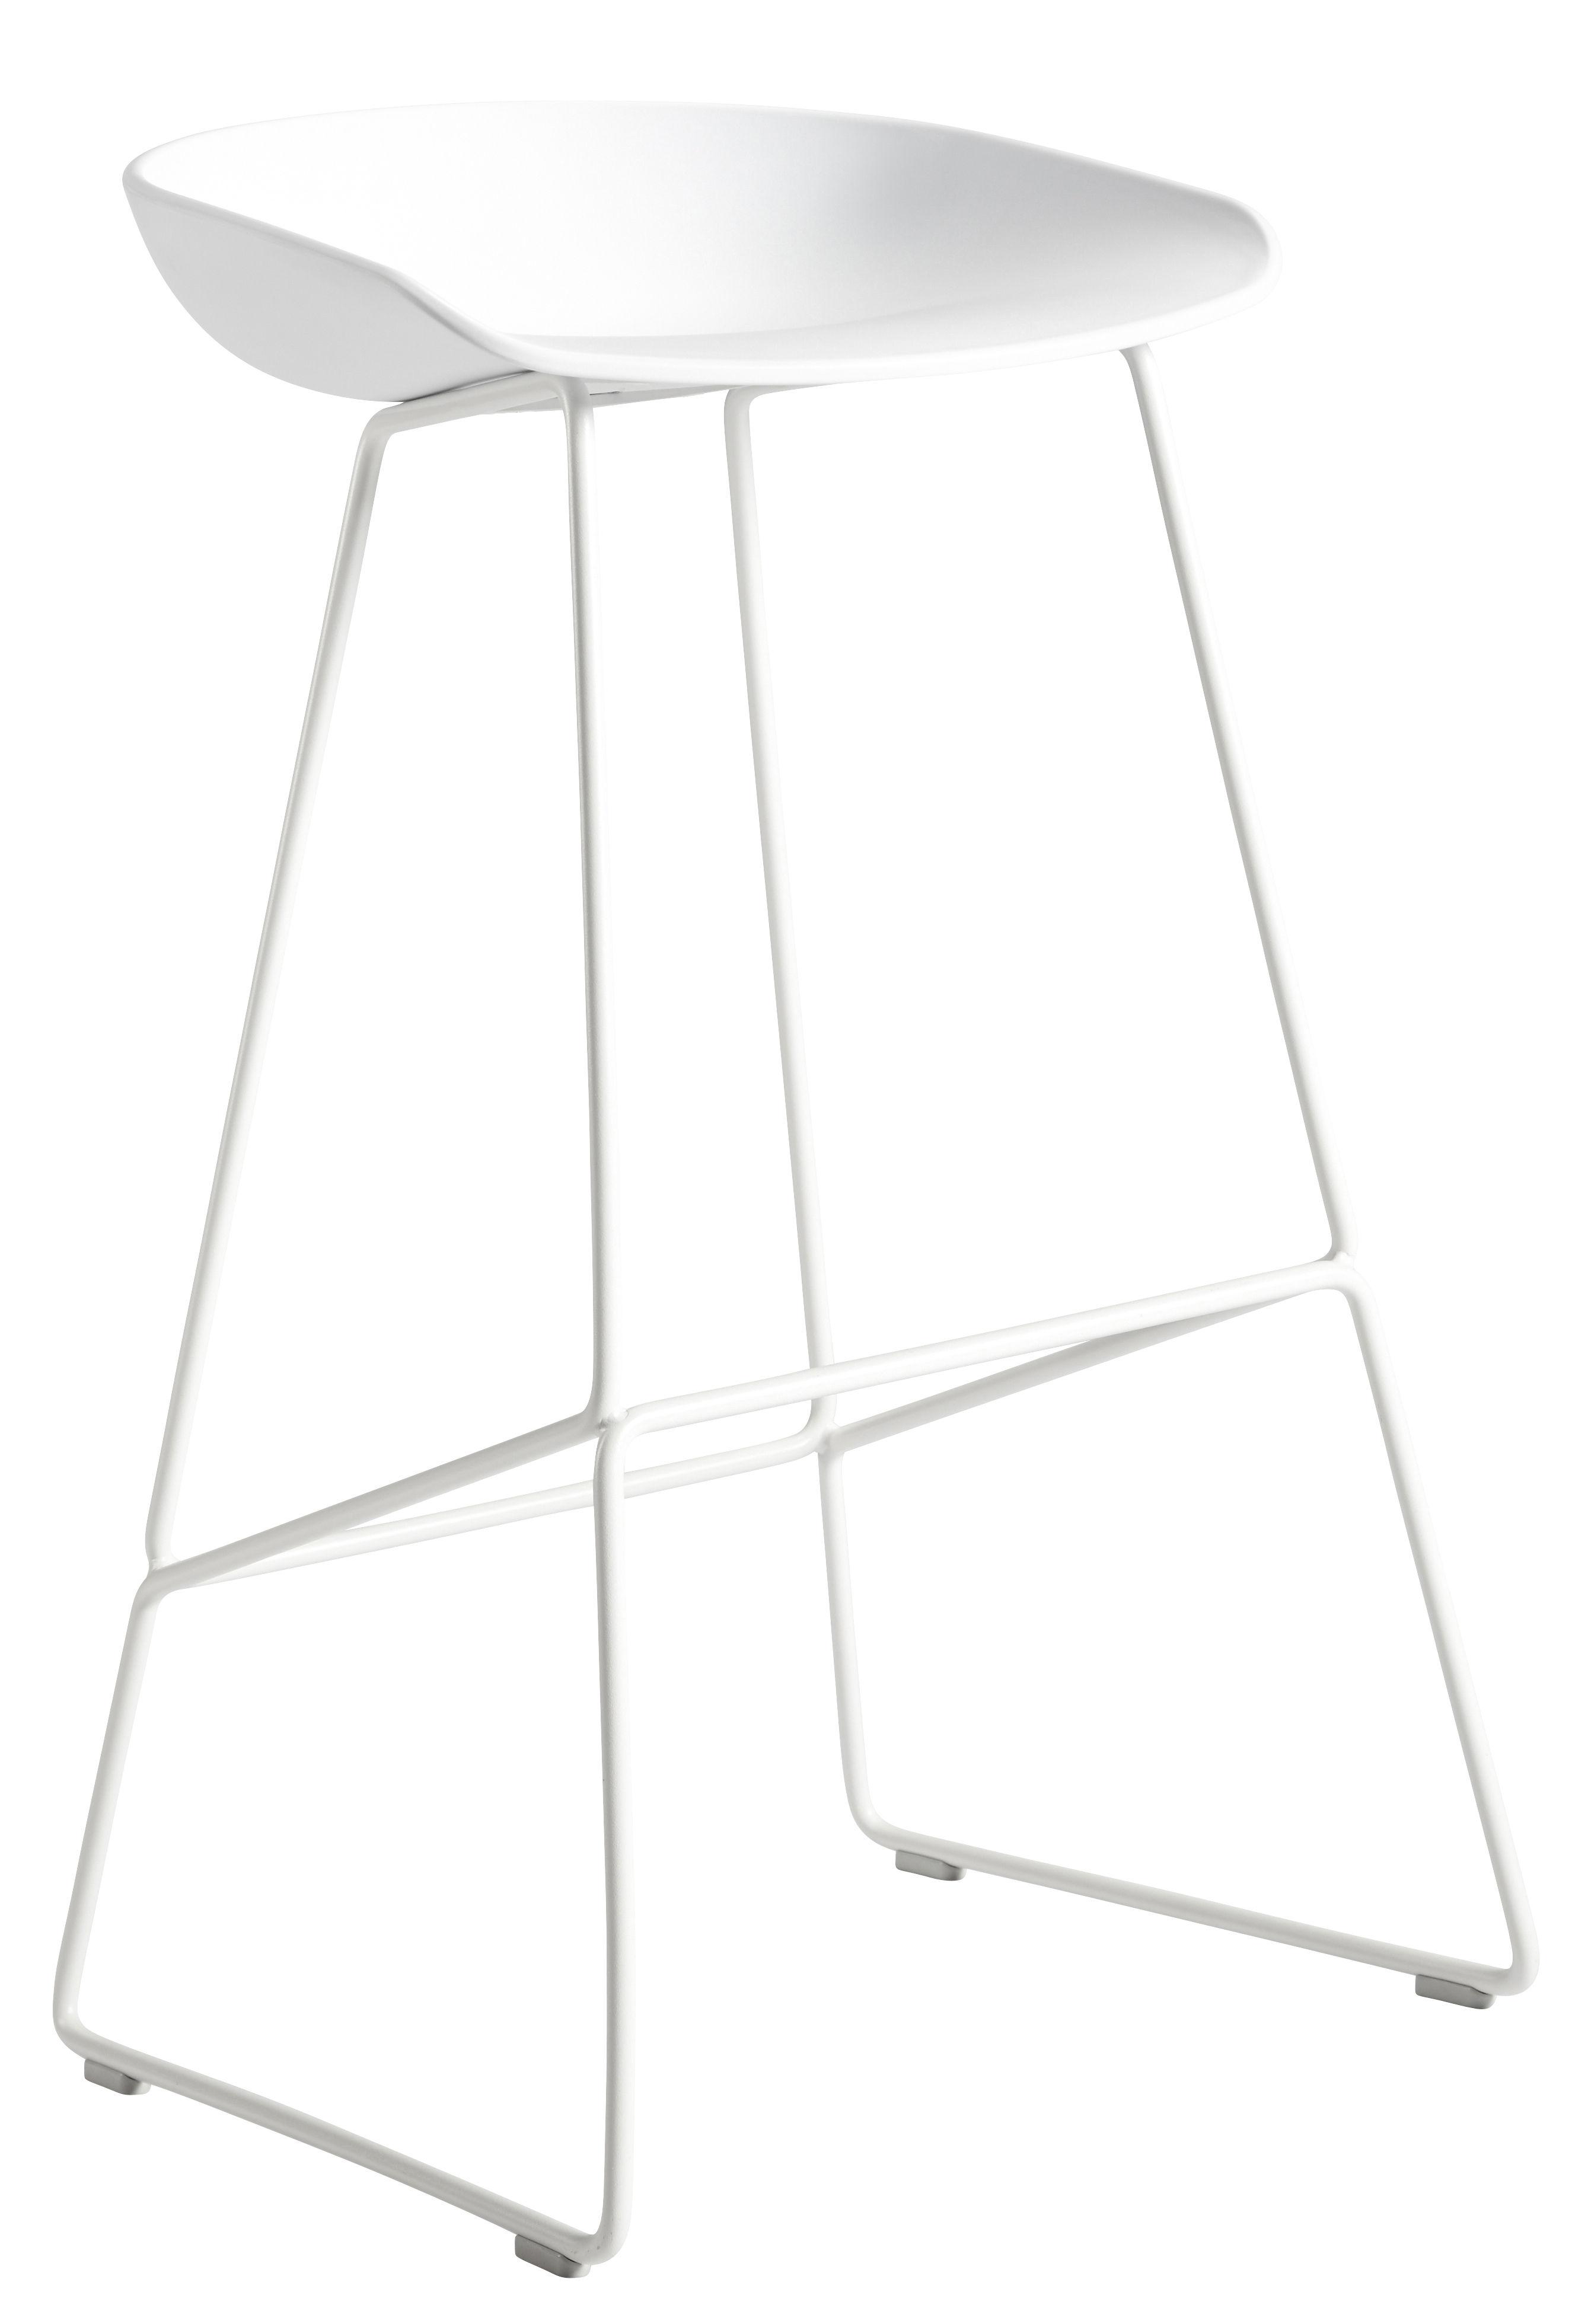 Möbel - Barhocker - About a stool AAS 38 Barhocker / H 75 cm - Kufengestell aus Stahl - Hay - Weiß - Polypropylen, Stahl